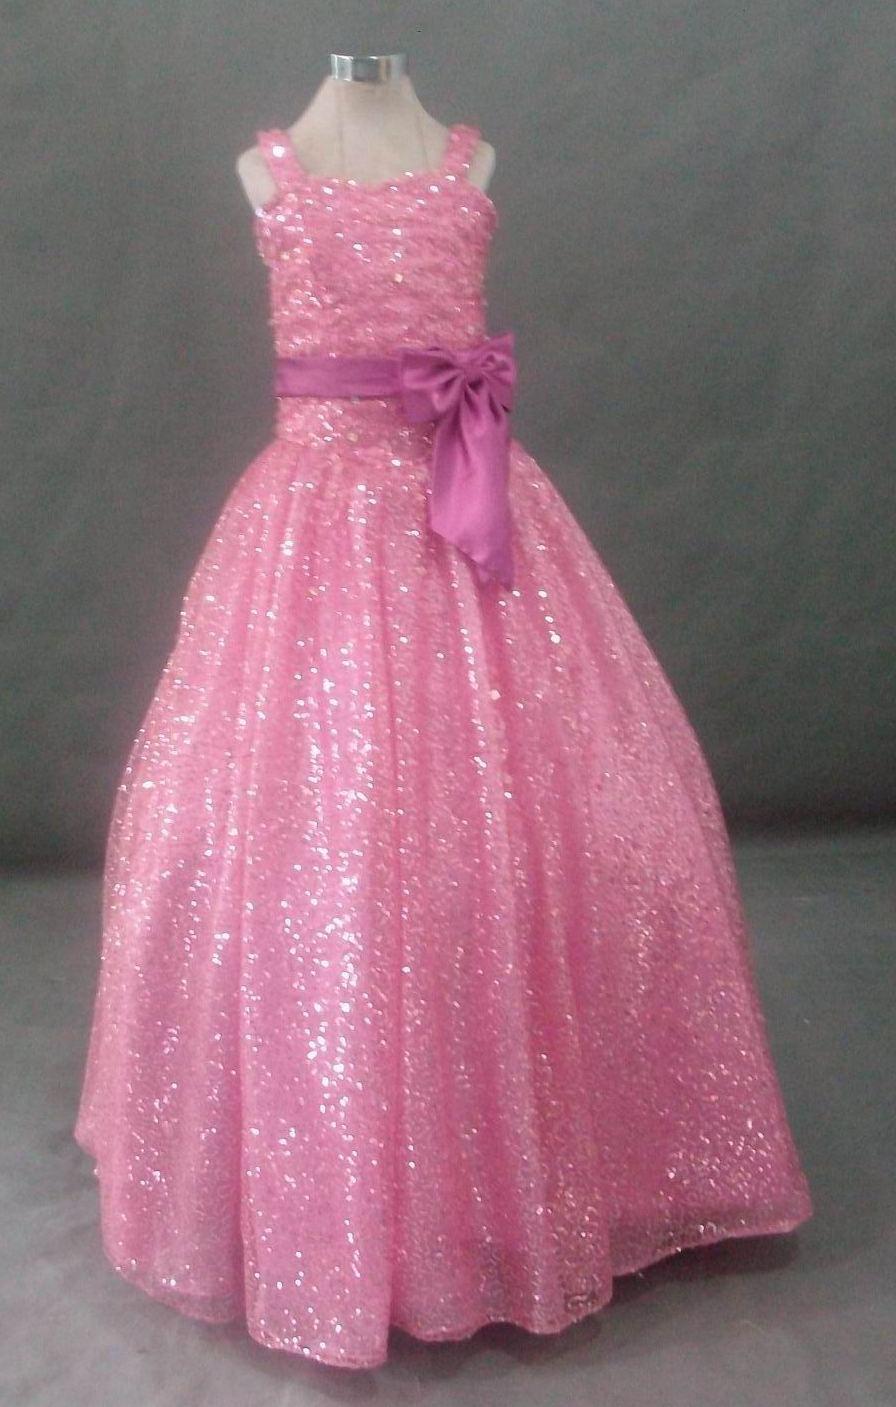 9d38412b4 Pink Glittery Girls Dresses